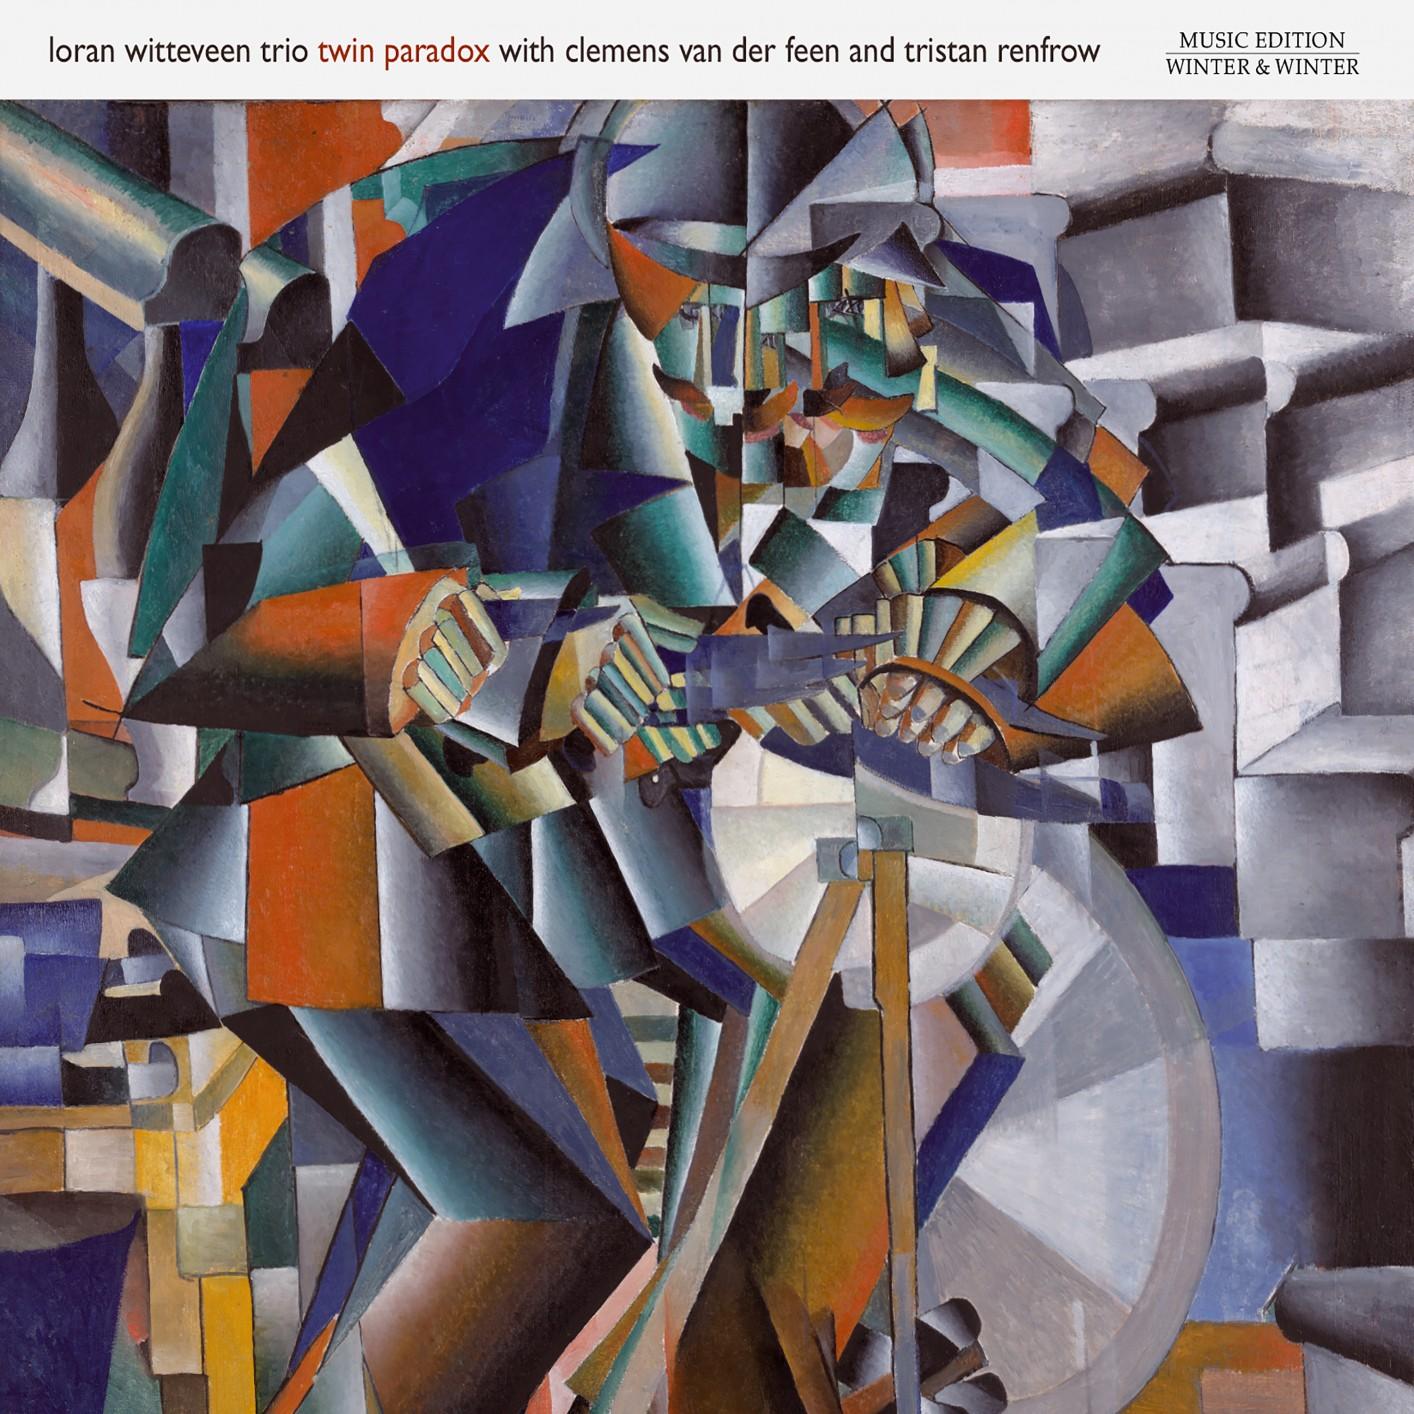 [TR24][OF] Loran Witteveen Trio - Twin Paradox - 2019 (Contemporary Jazz)